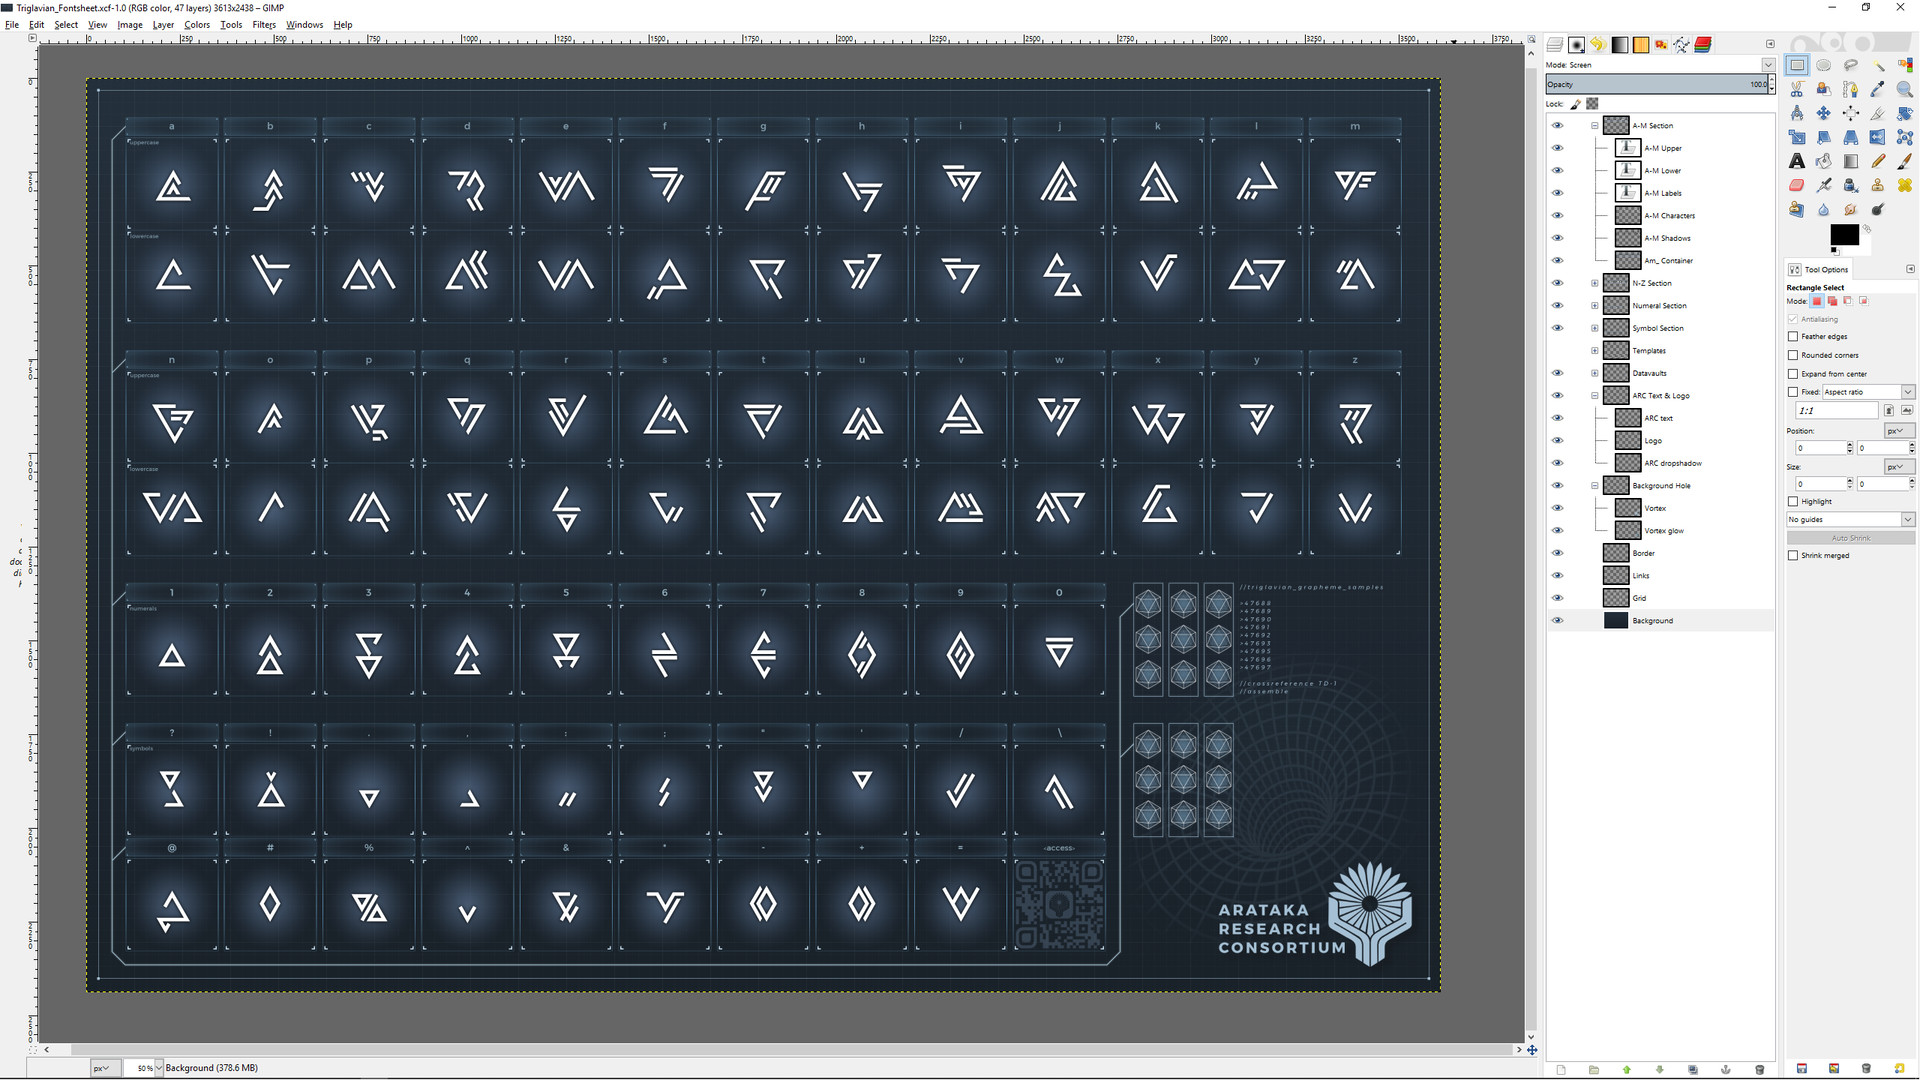 ArtStation - Triglavian Alphabetical Chart, Nicholas Antonucci